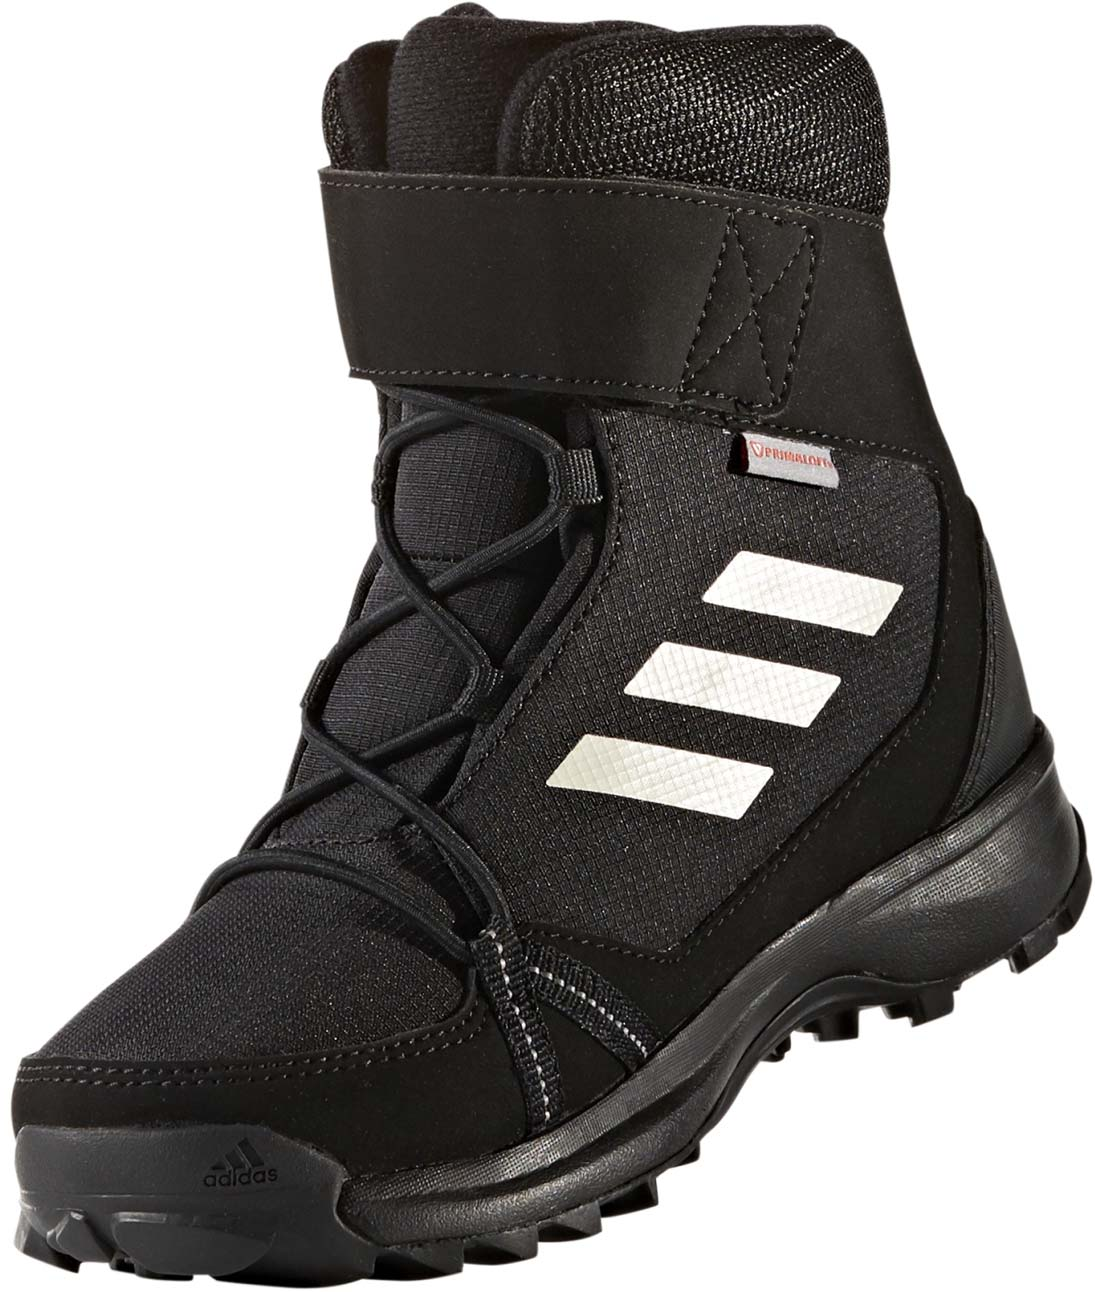 d9facfbfa7714 adidas TERREX SNOW CF CP CW K. Dětská outdoorová obuv. Dětská outdoorová  obuv. Dětská outdoorová obuv. Dětská outdoorová obuv